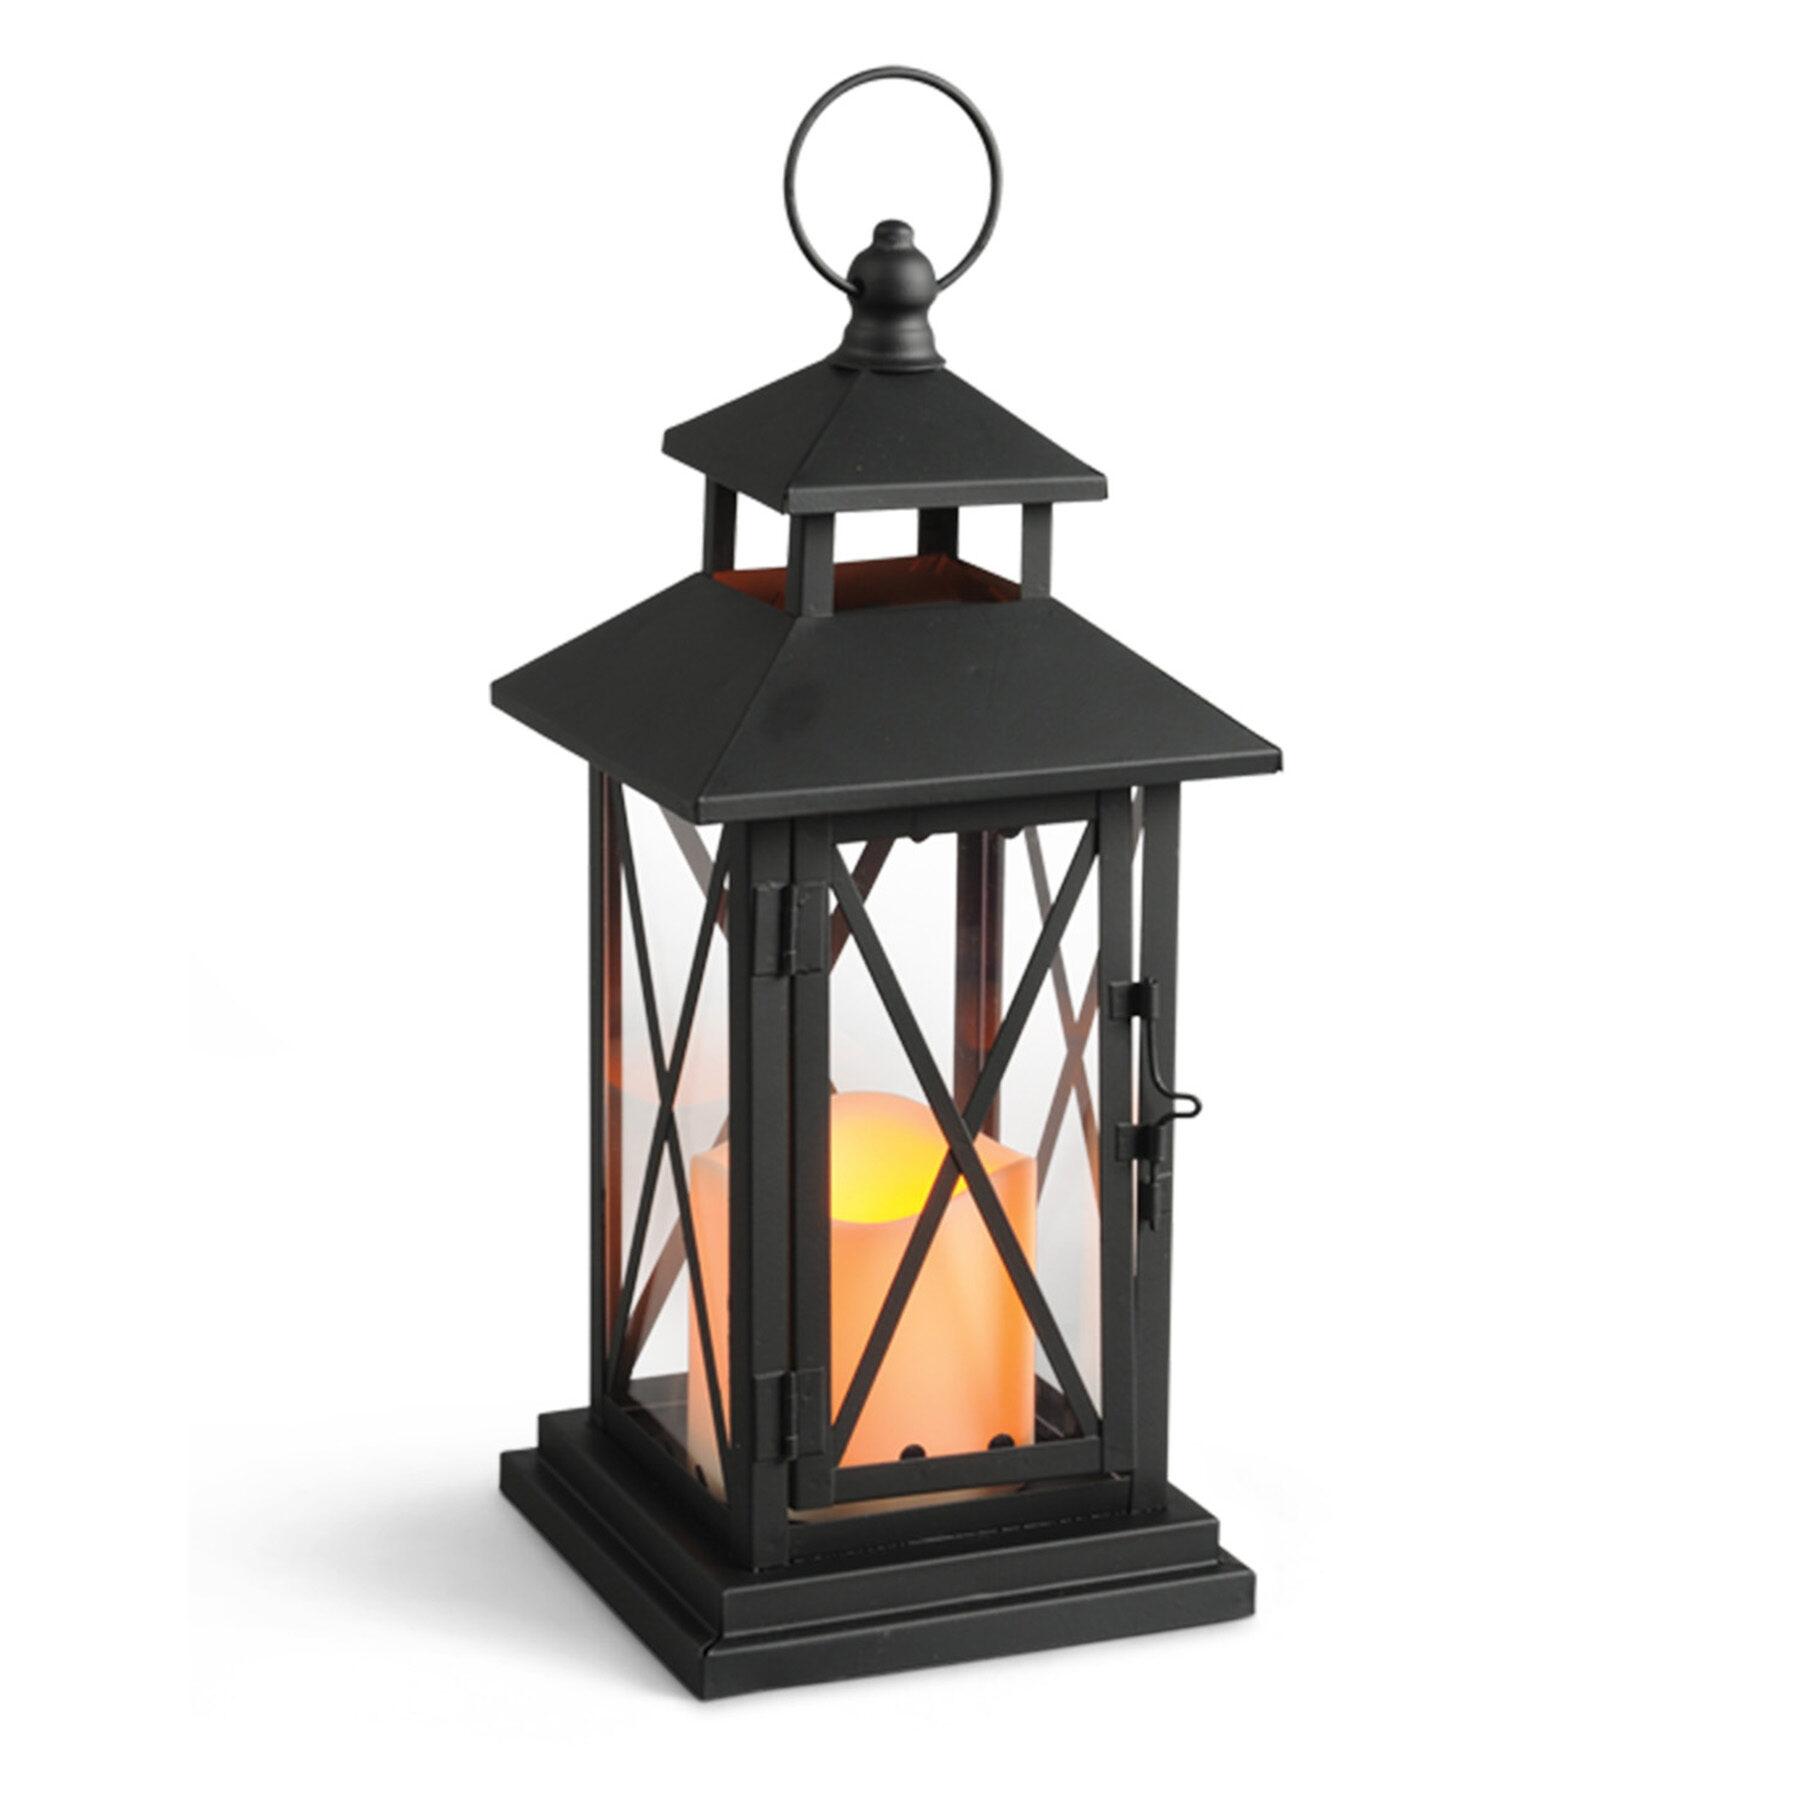 Victorian Criss Cross Outdoor Candle Lantern